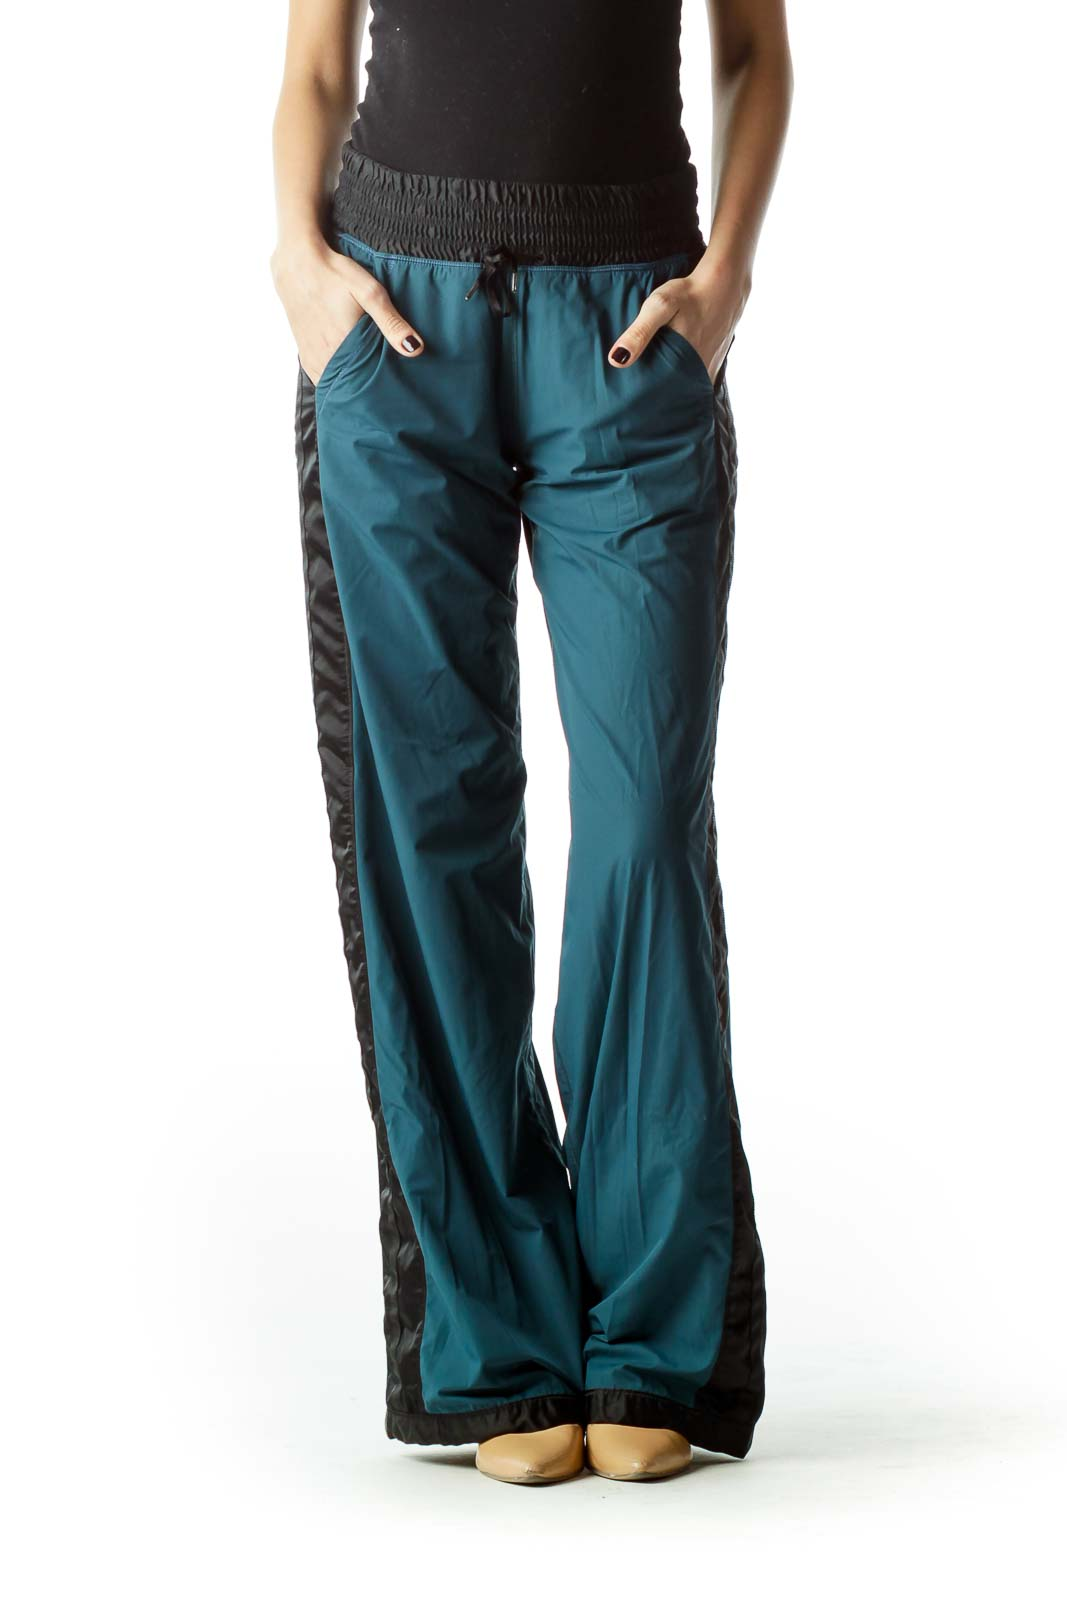 Blue Black Sports Pants with Drawstring